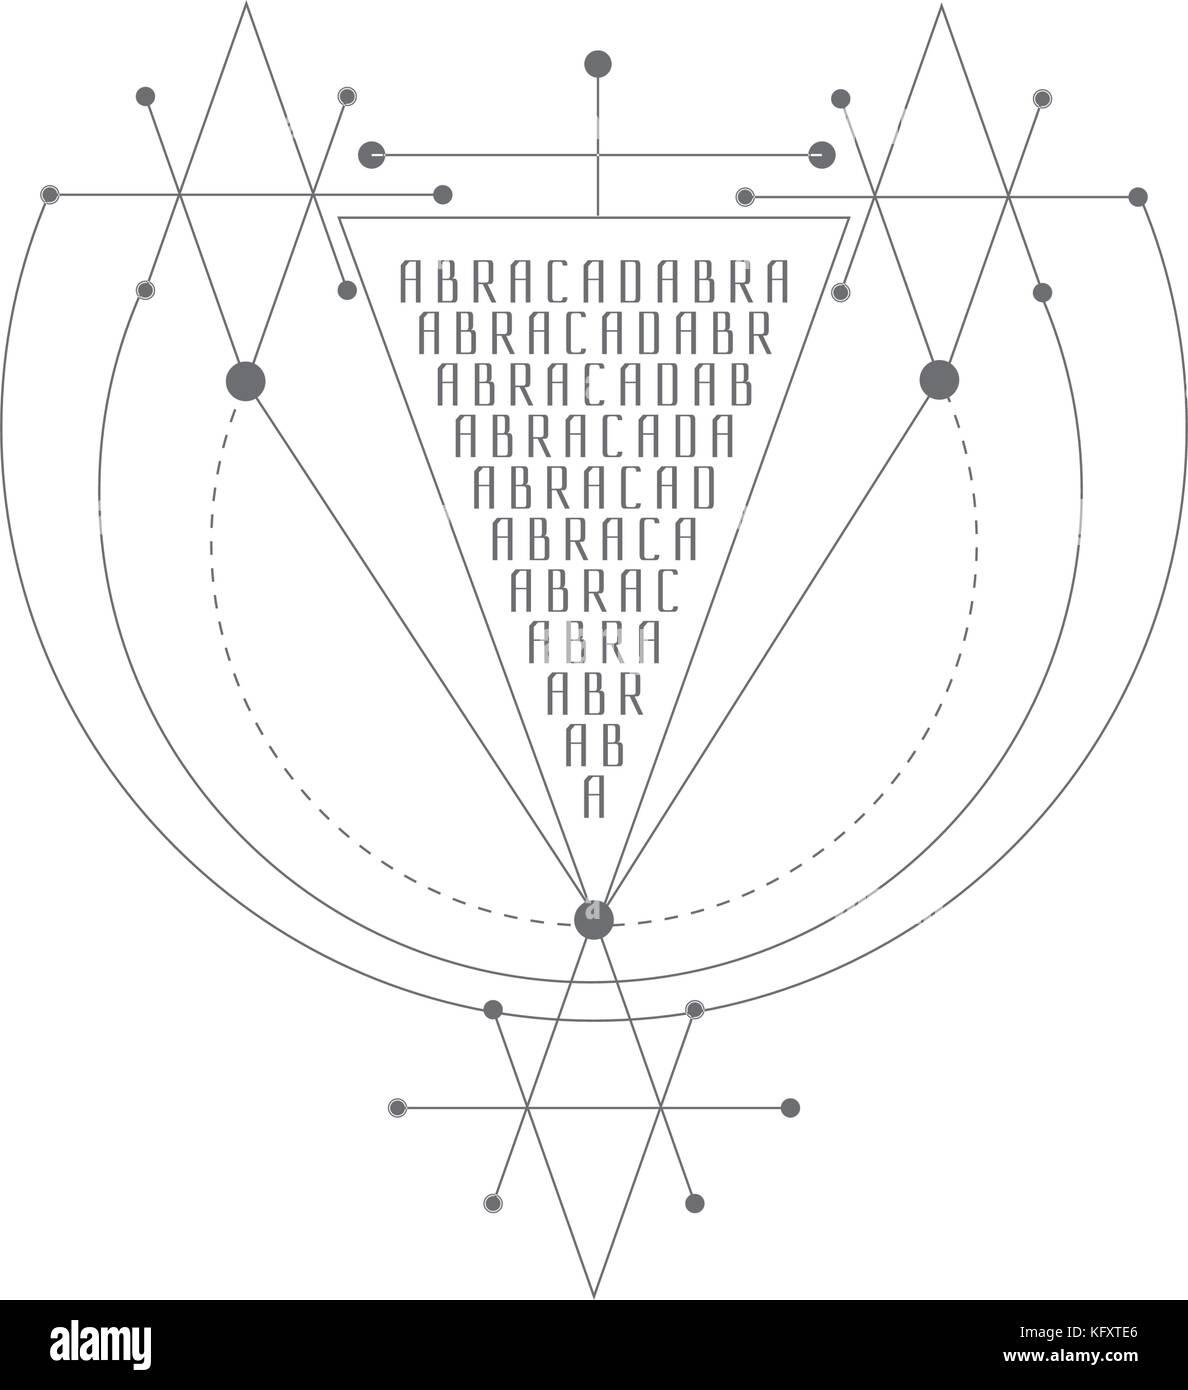 2e6bf1b34dcc6 Vector magic alchemy symbol. geometric logo for spirituality, occultism,  tattoo art and print